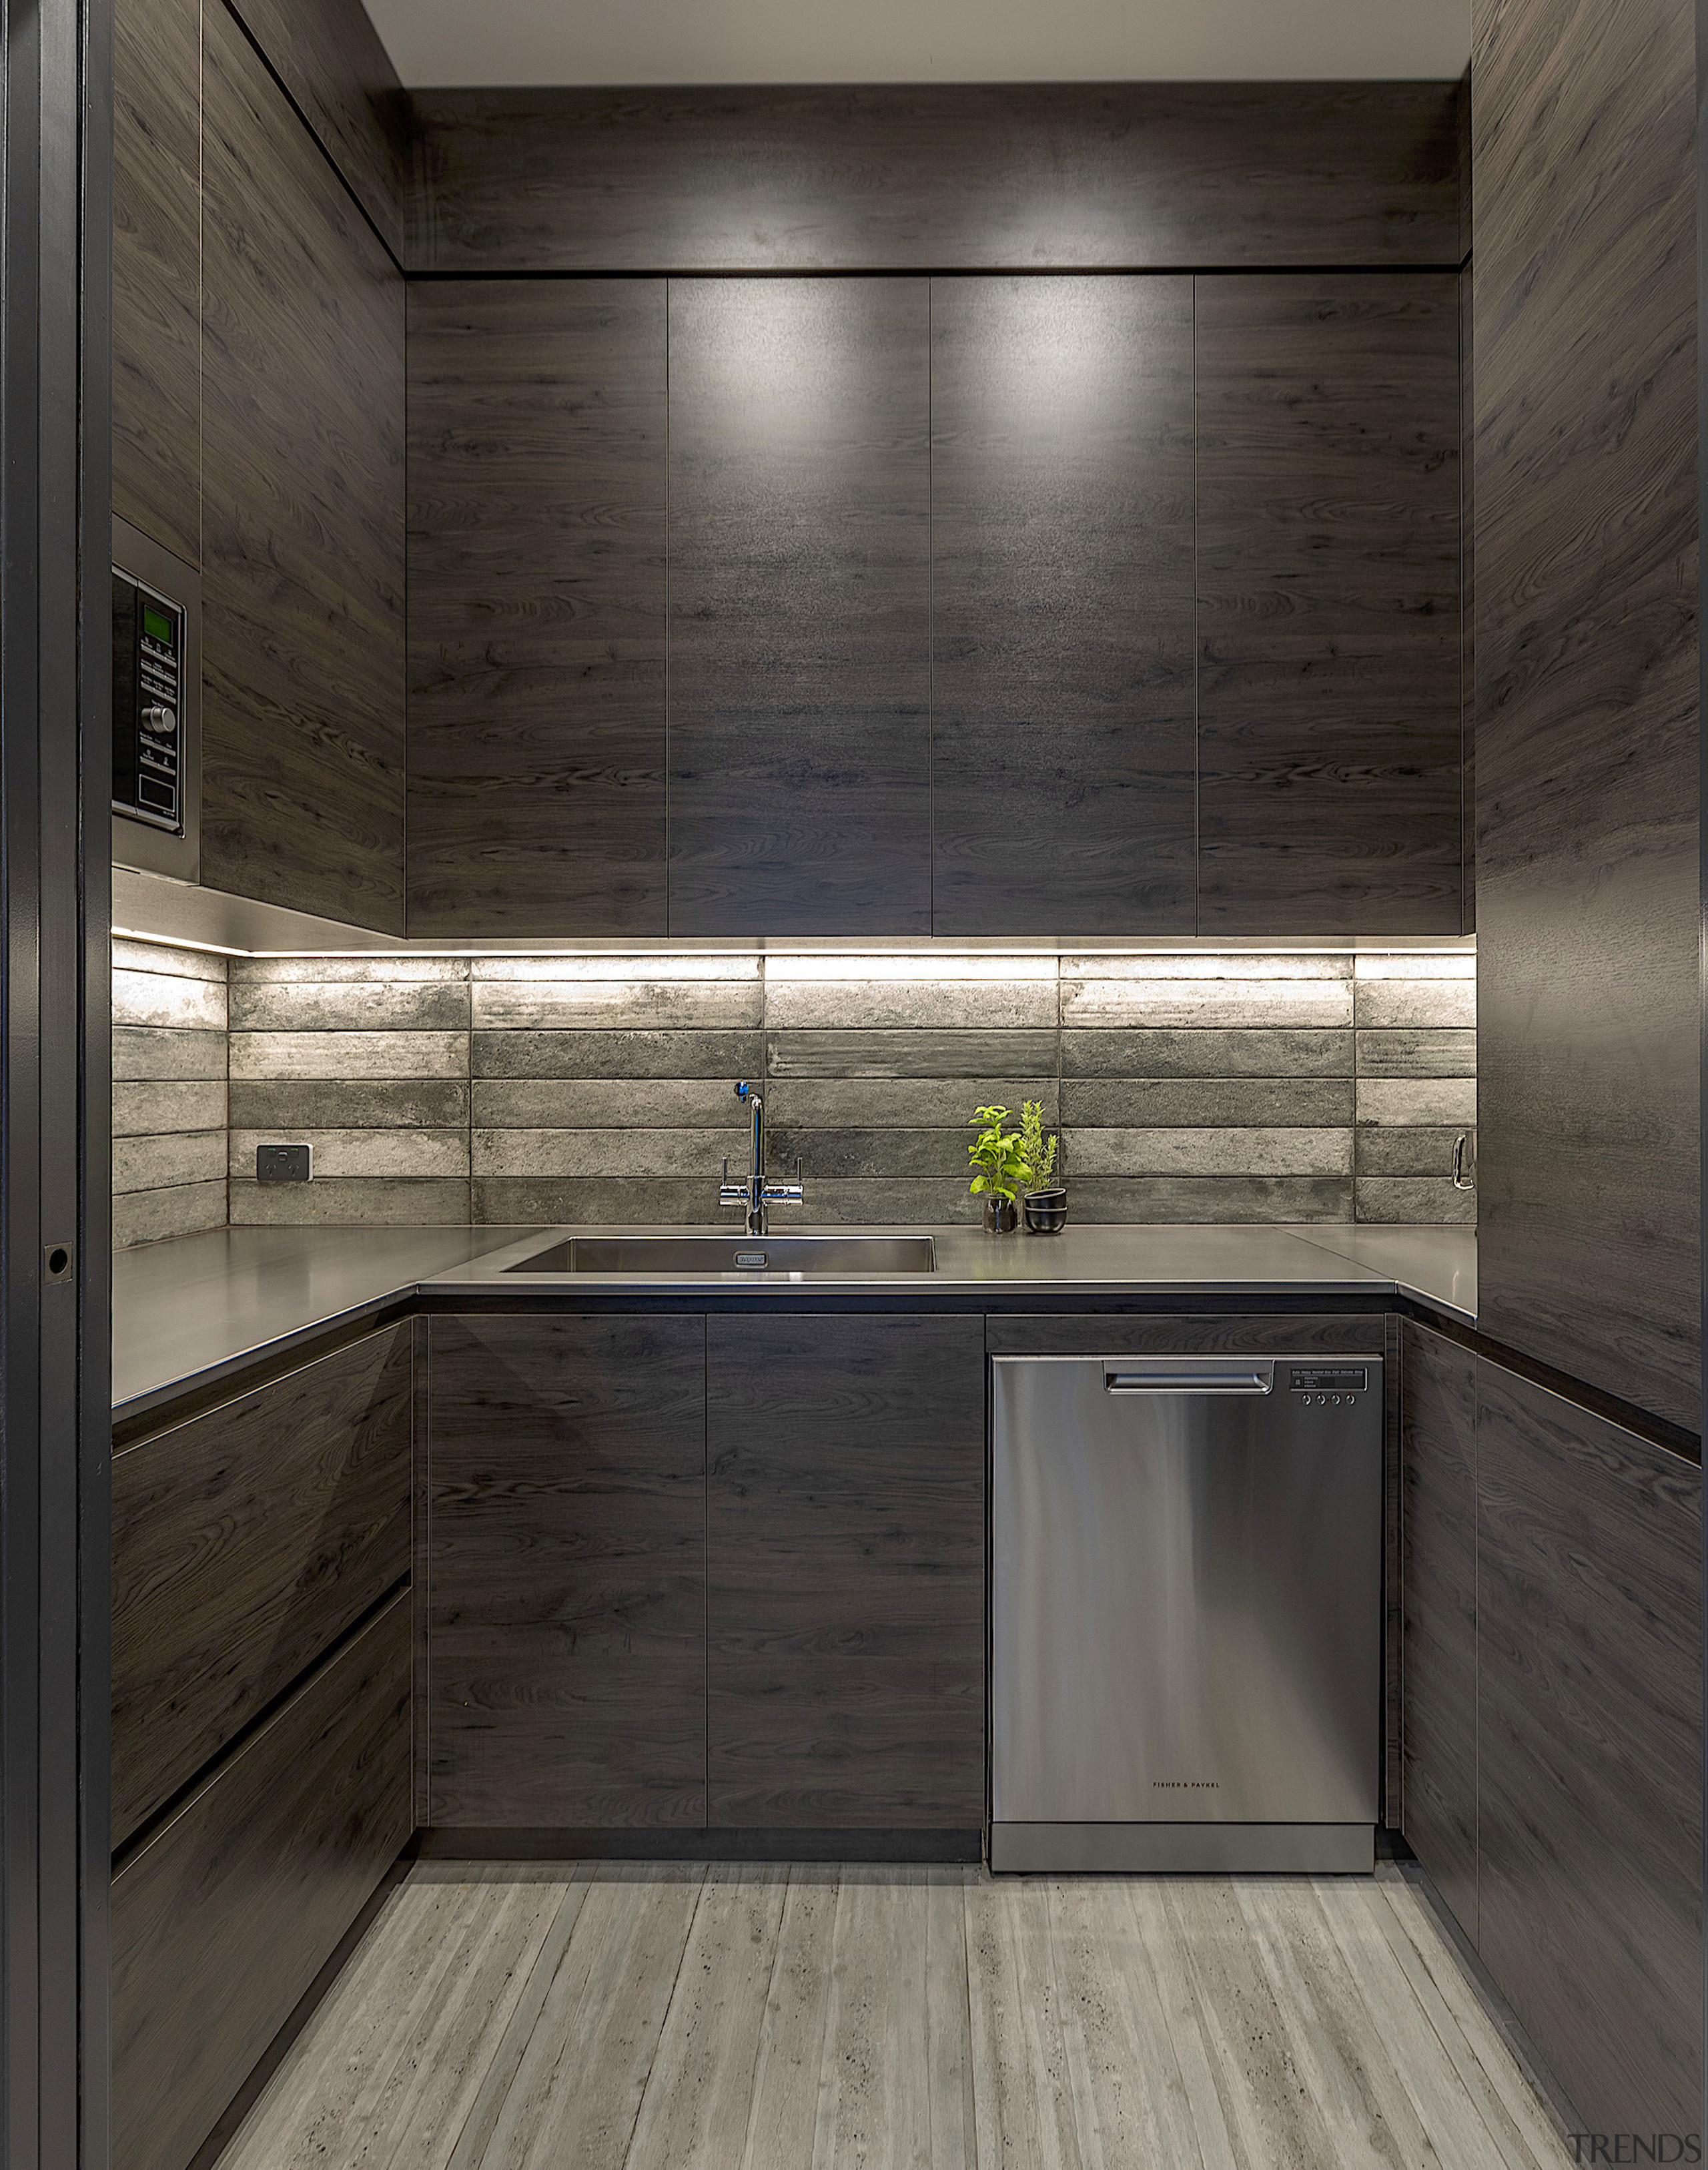 Hard-wearing Dekton benchtops in this kitchen give way black, gray